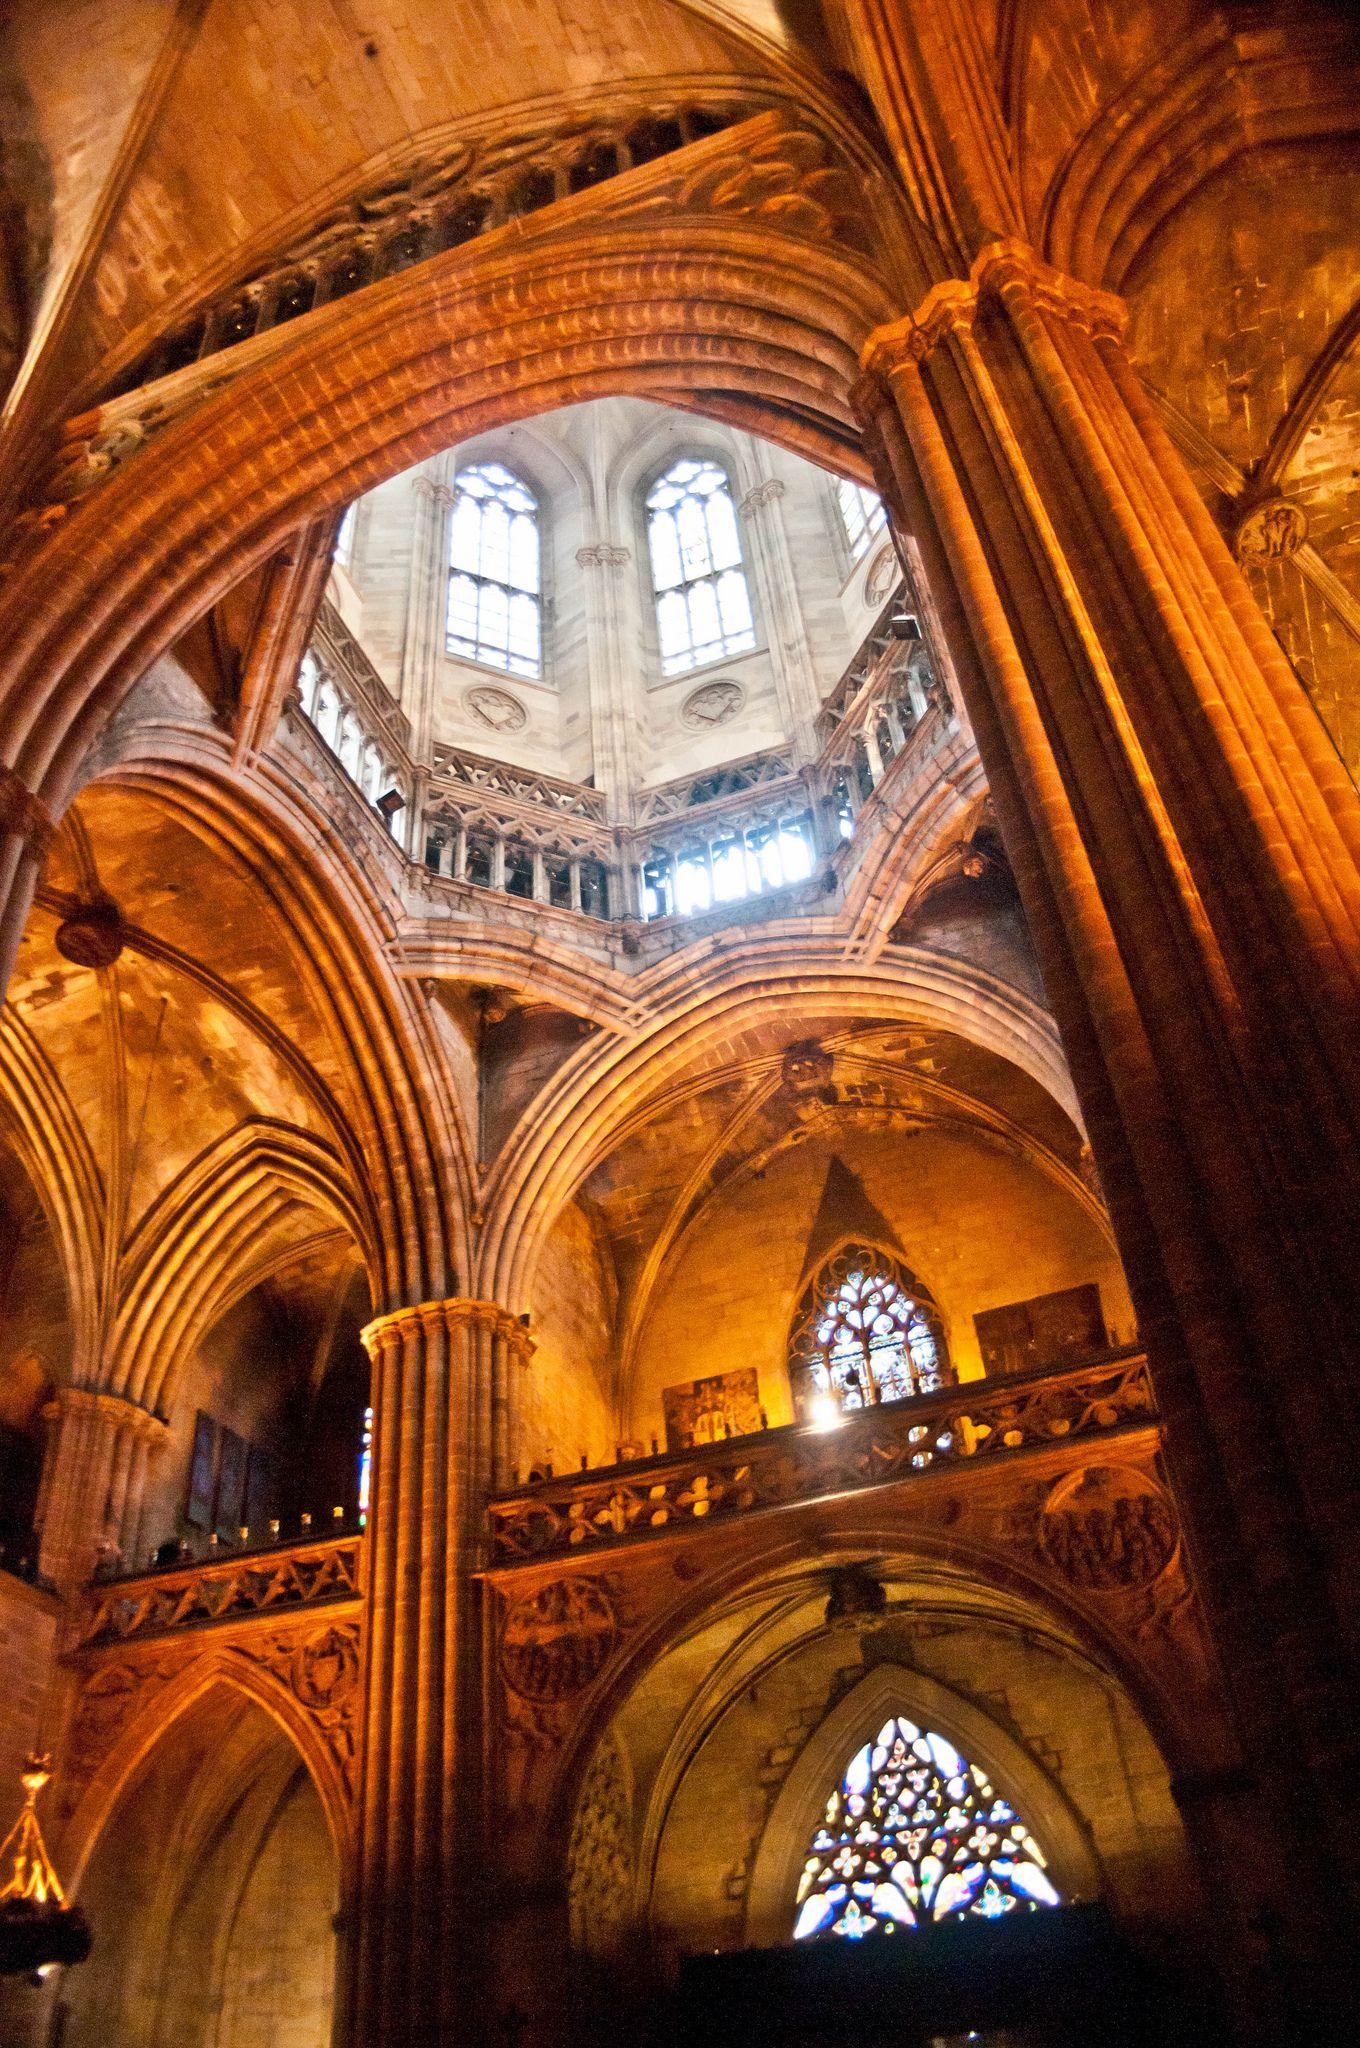 Interior de la catedral barcelona catalu a spain for Interior de la catedral de barcelona